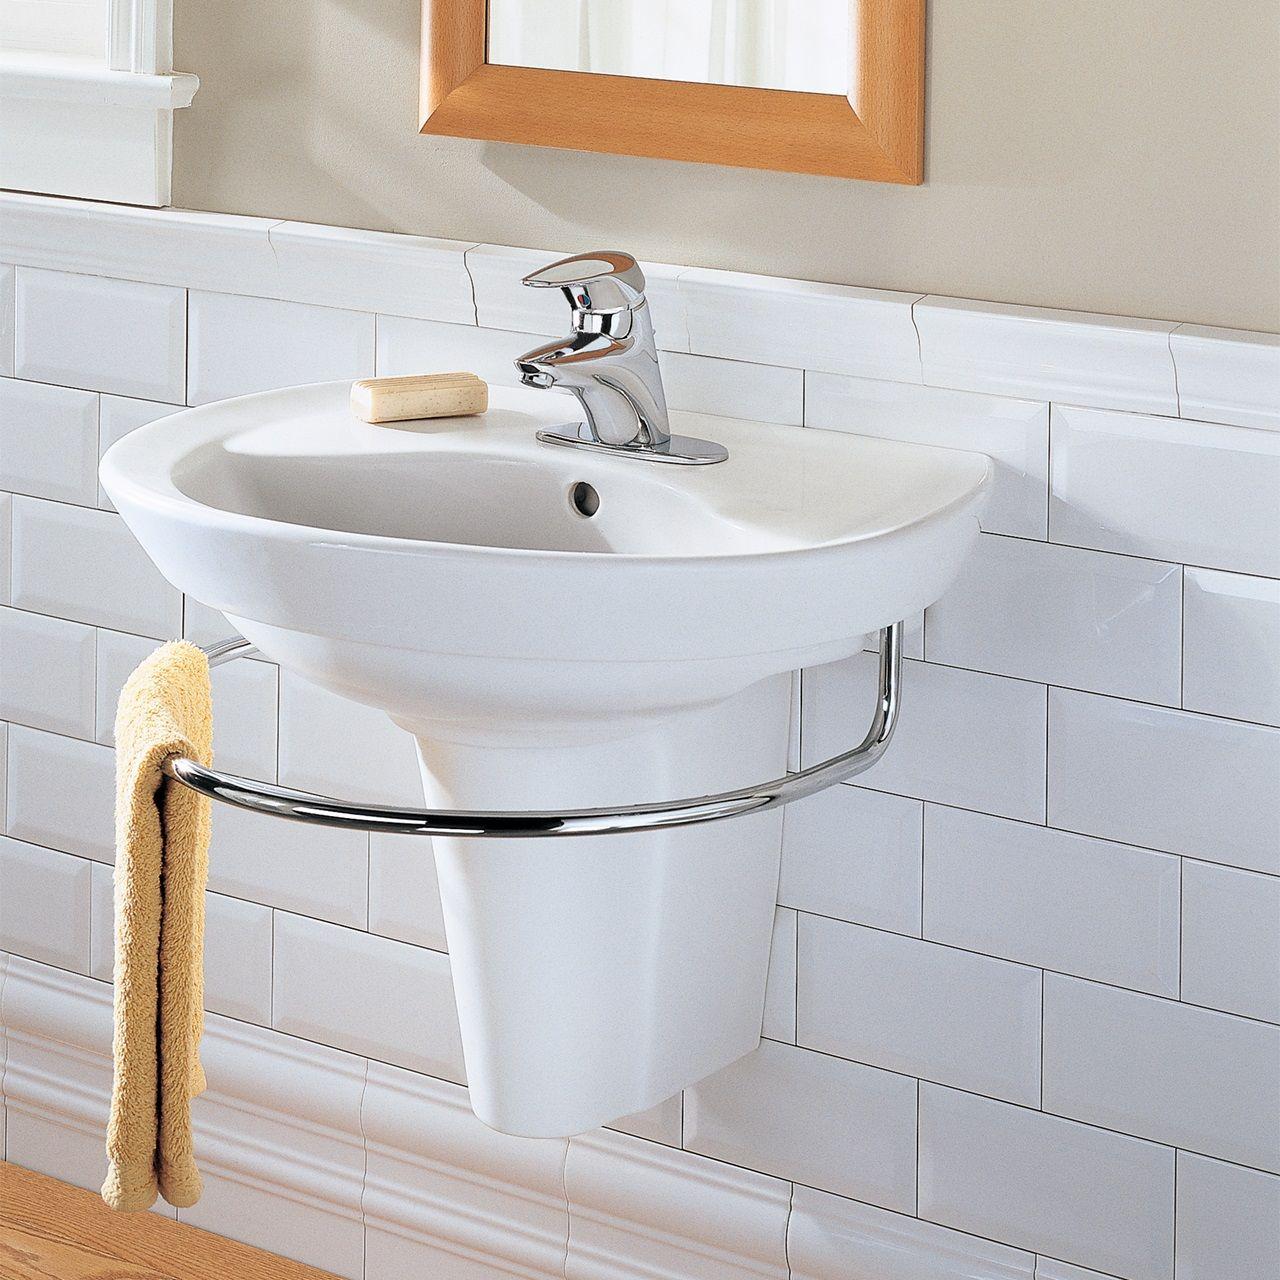 Genial Bathroom Sinks   Ravenna Wall Mount Sink   White